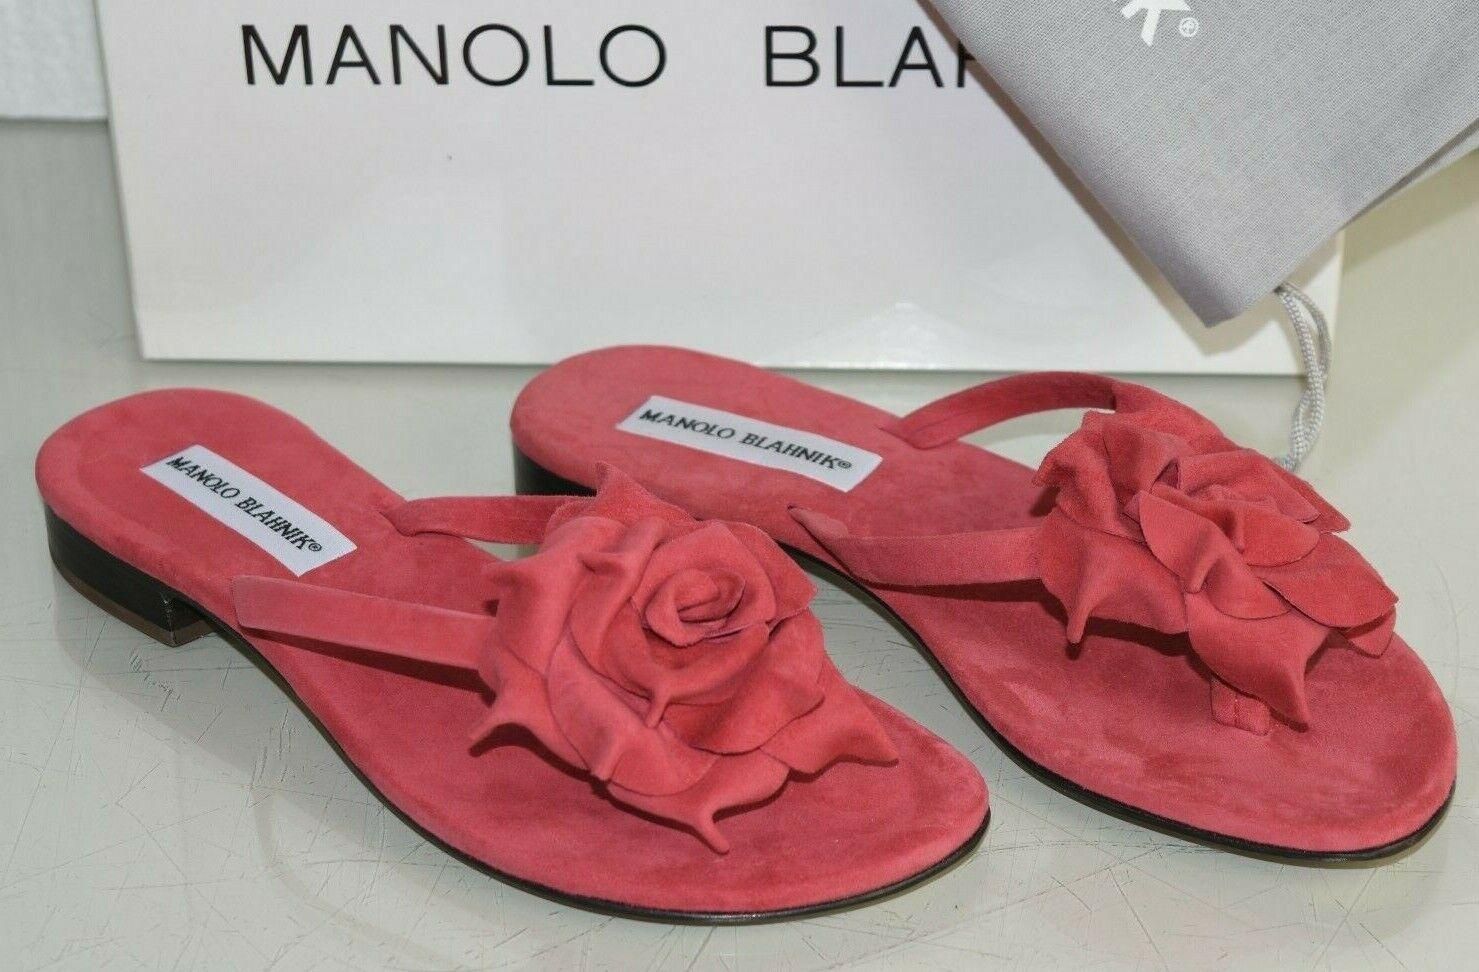 Neuf Manolo Blahnik Patricia String Sandales Plates Corail red shoes Daim